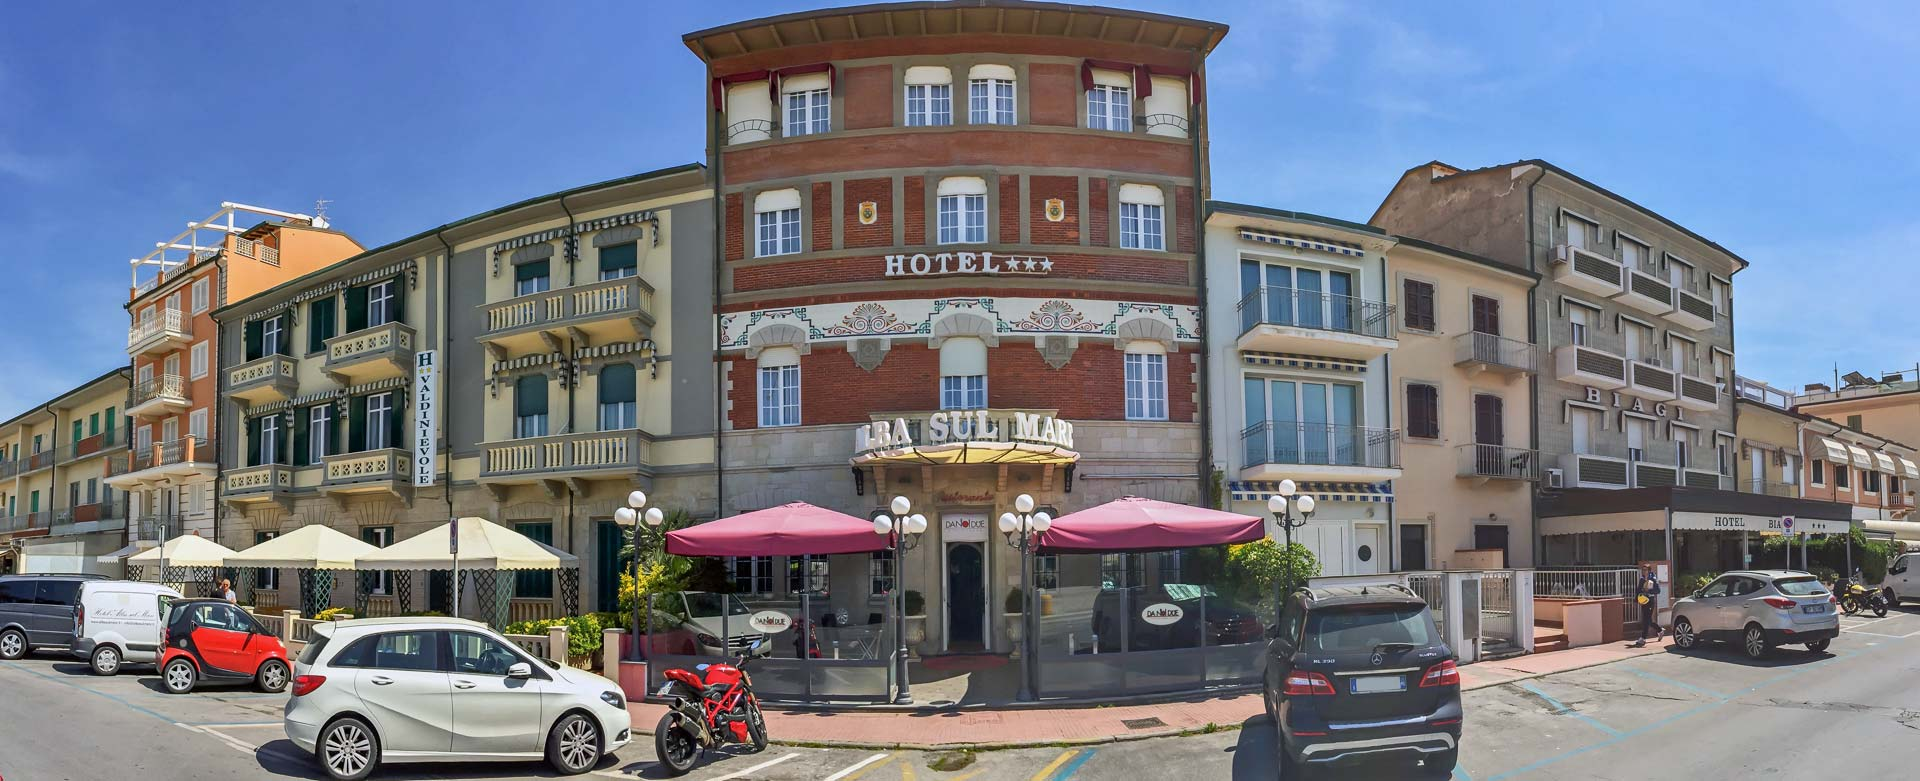 Hotel La Place Pisa